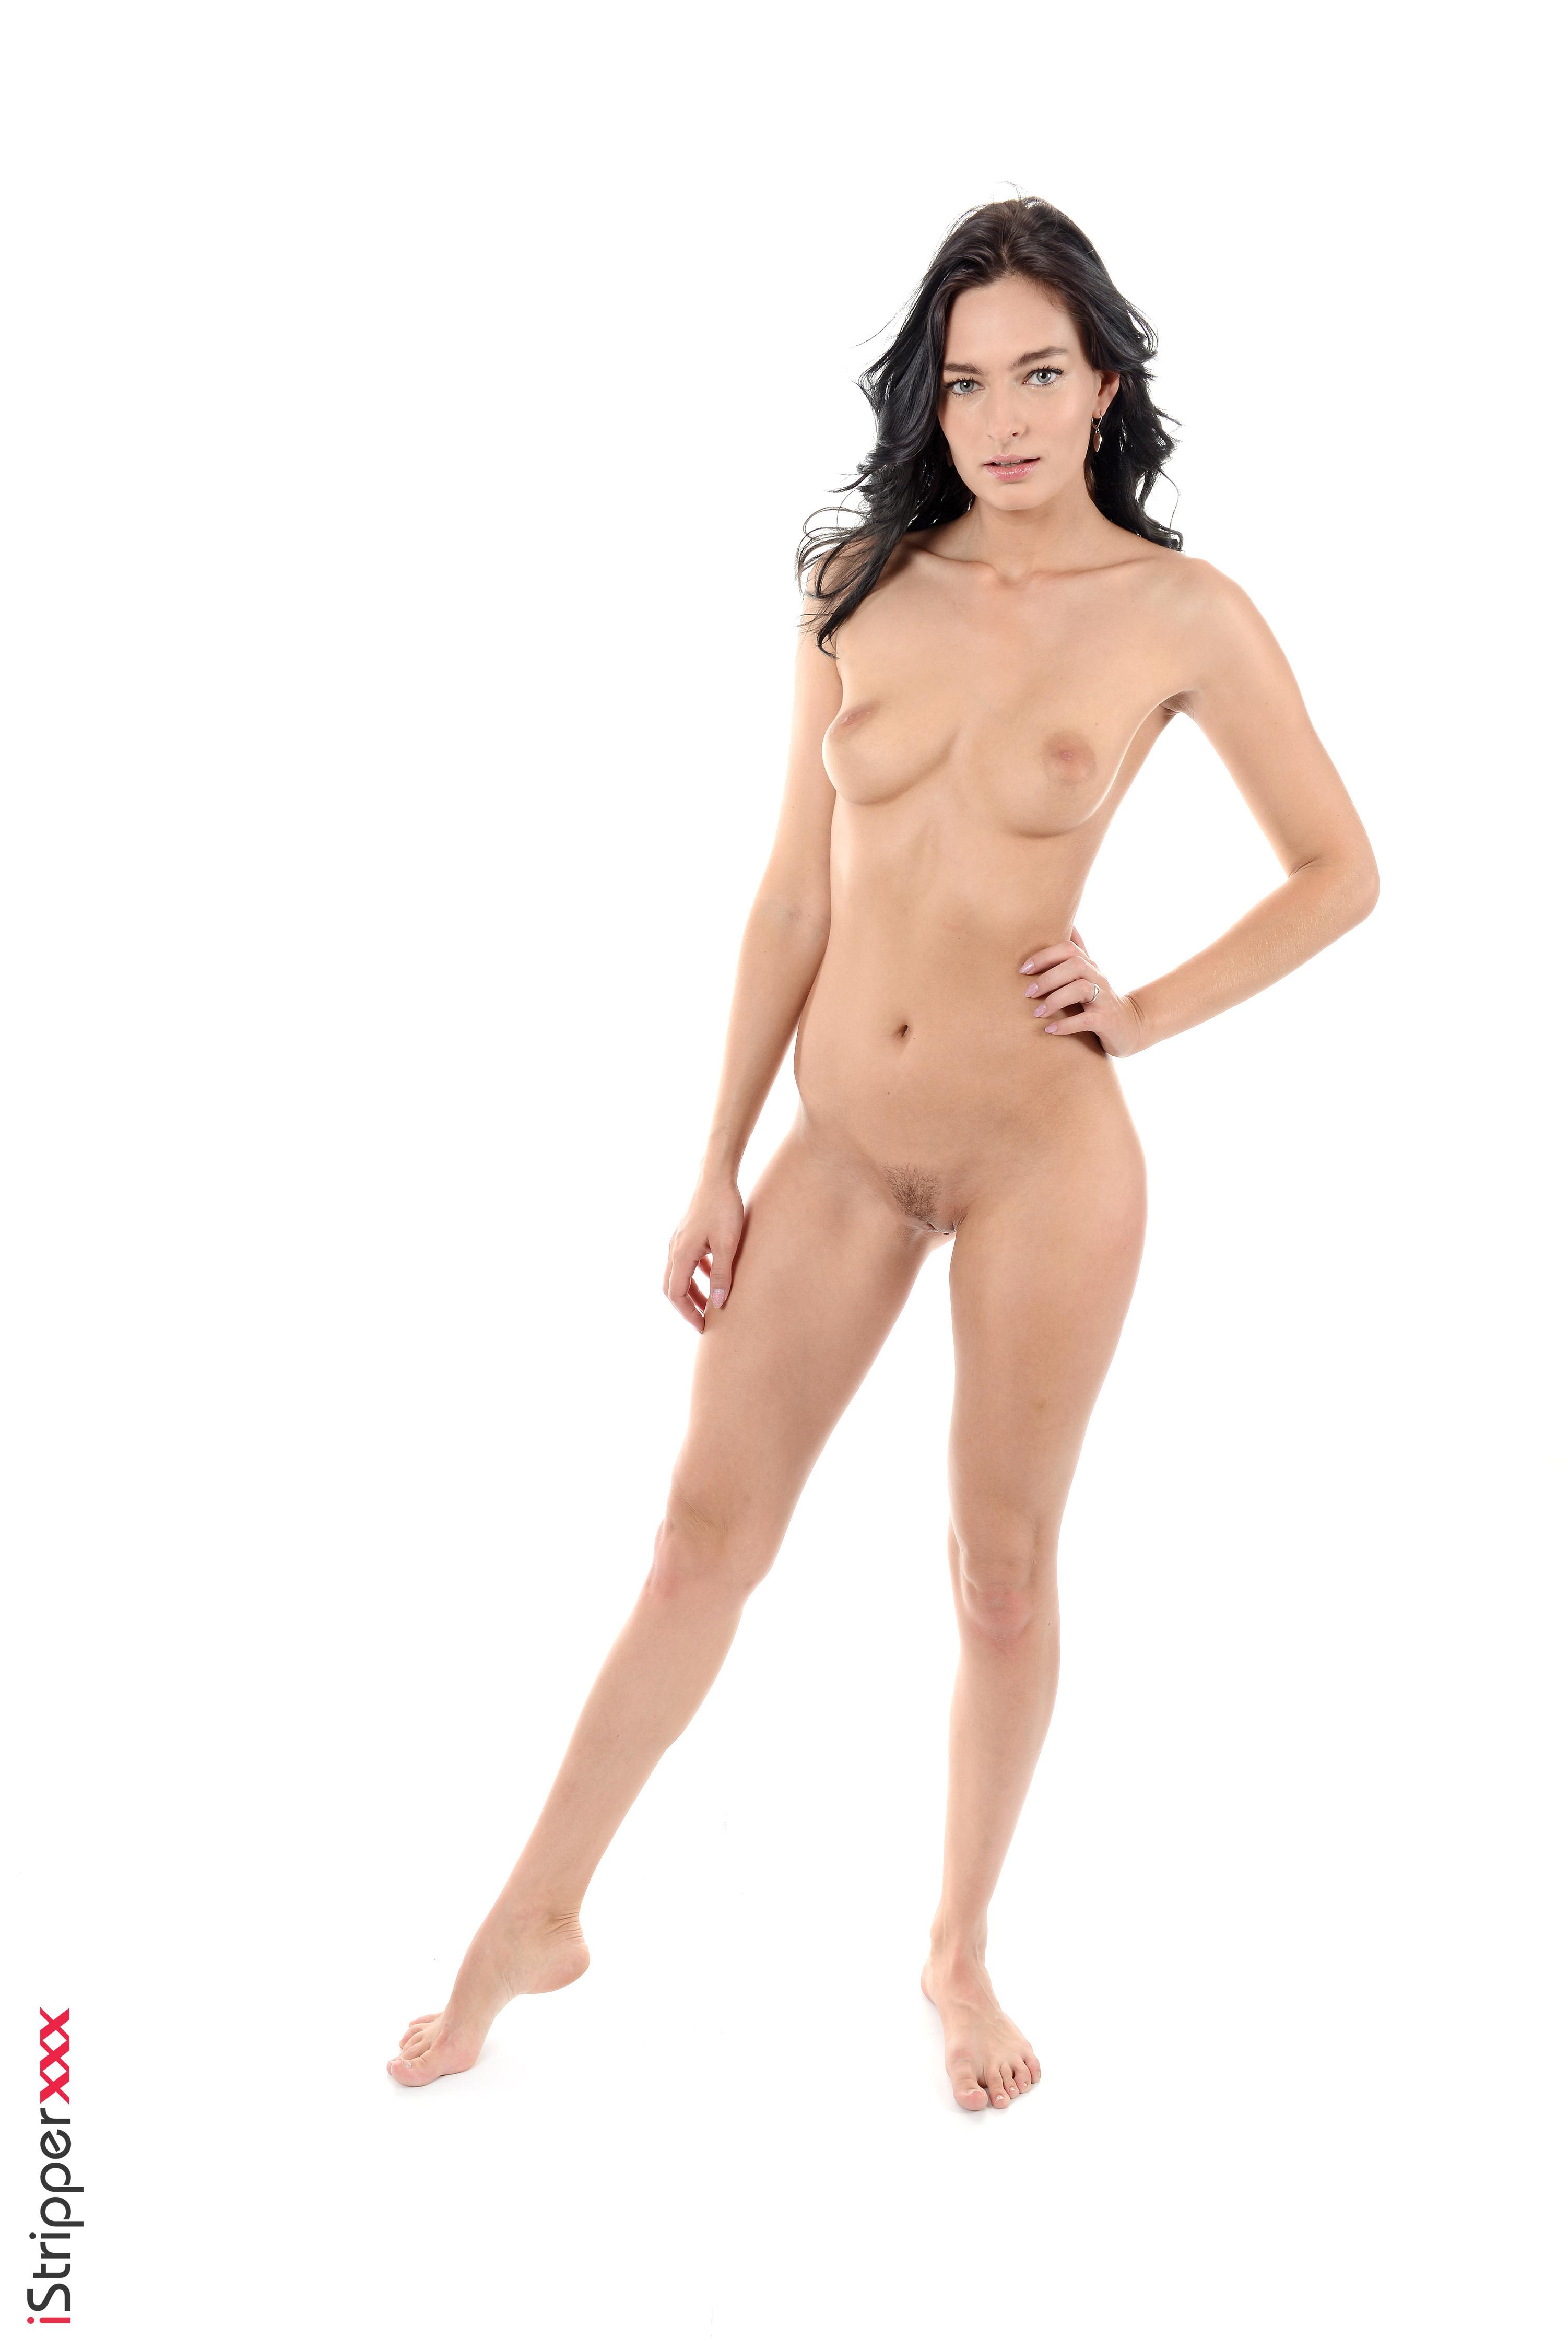 military girls stripping